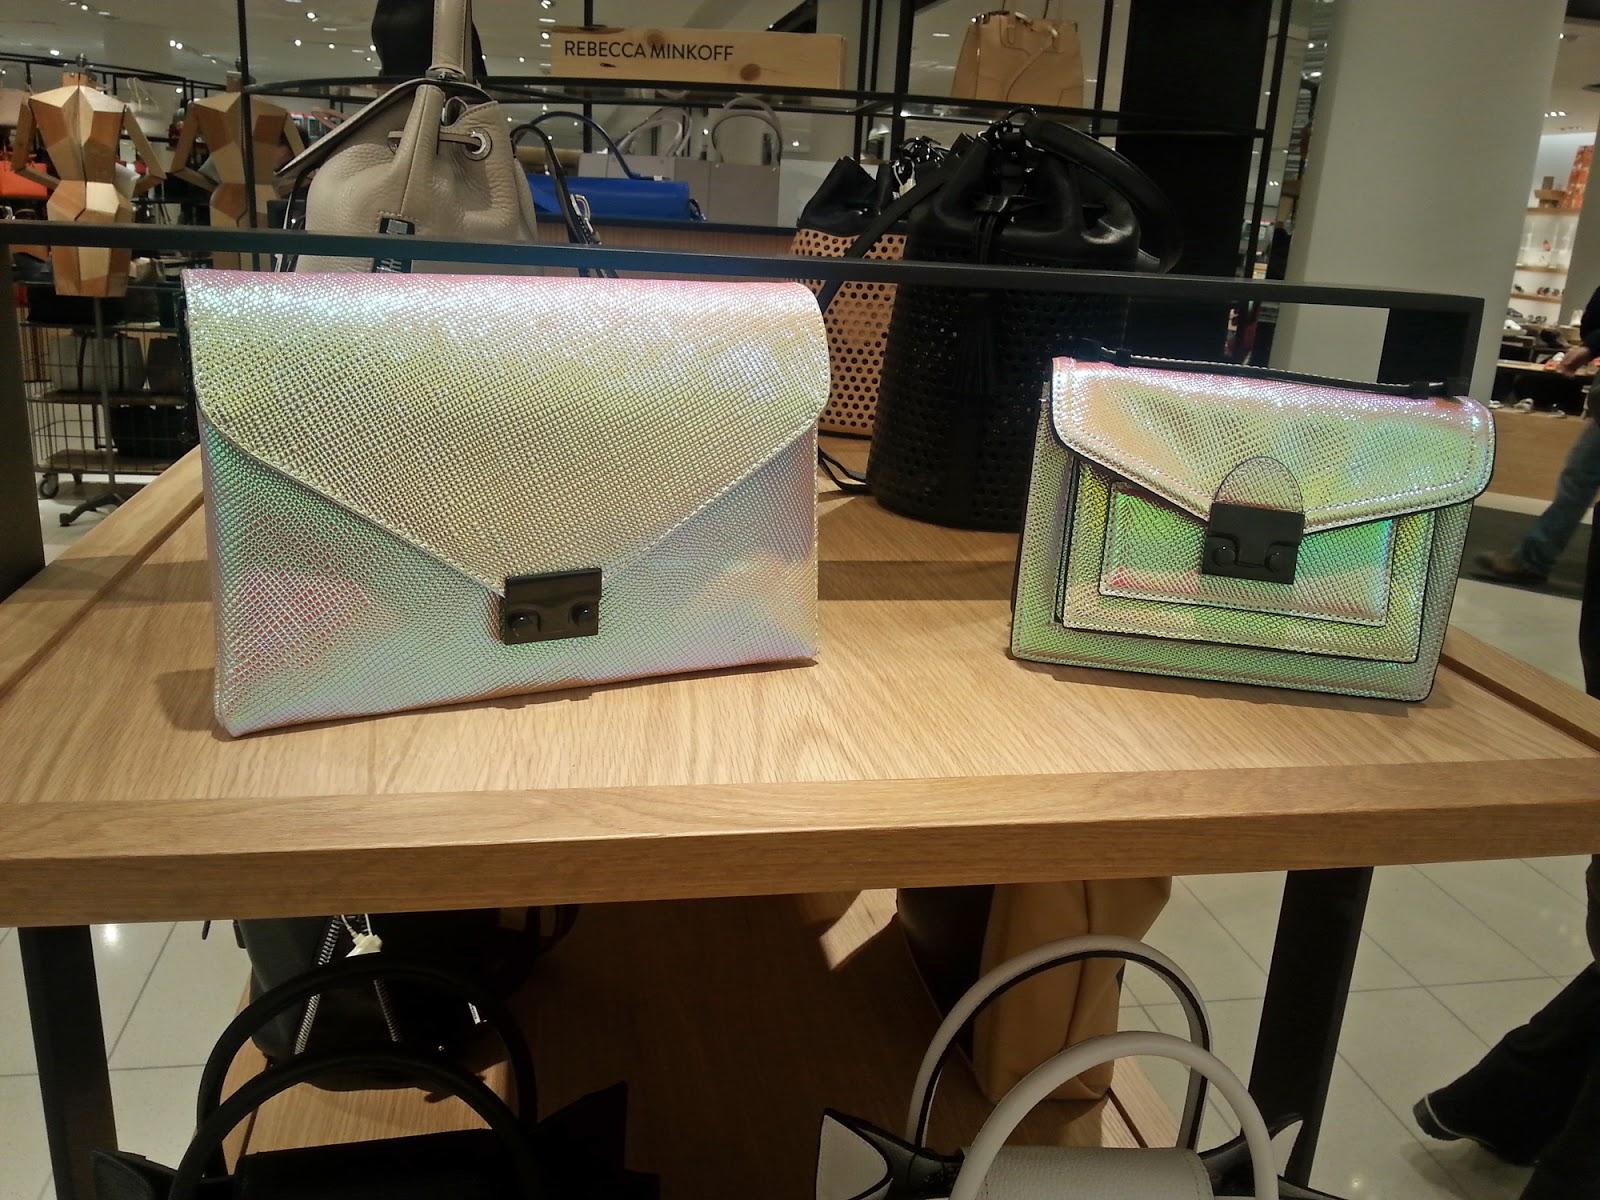 Loeffler Randall Mini Rider bag and Lock Clutch - both in a beautiful iridescent finish